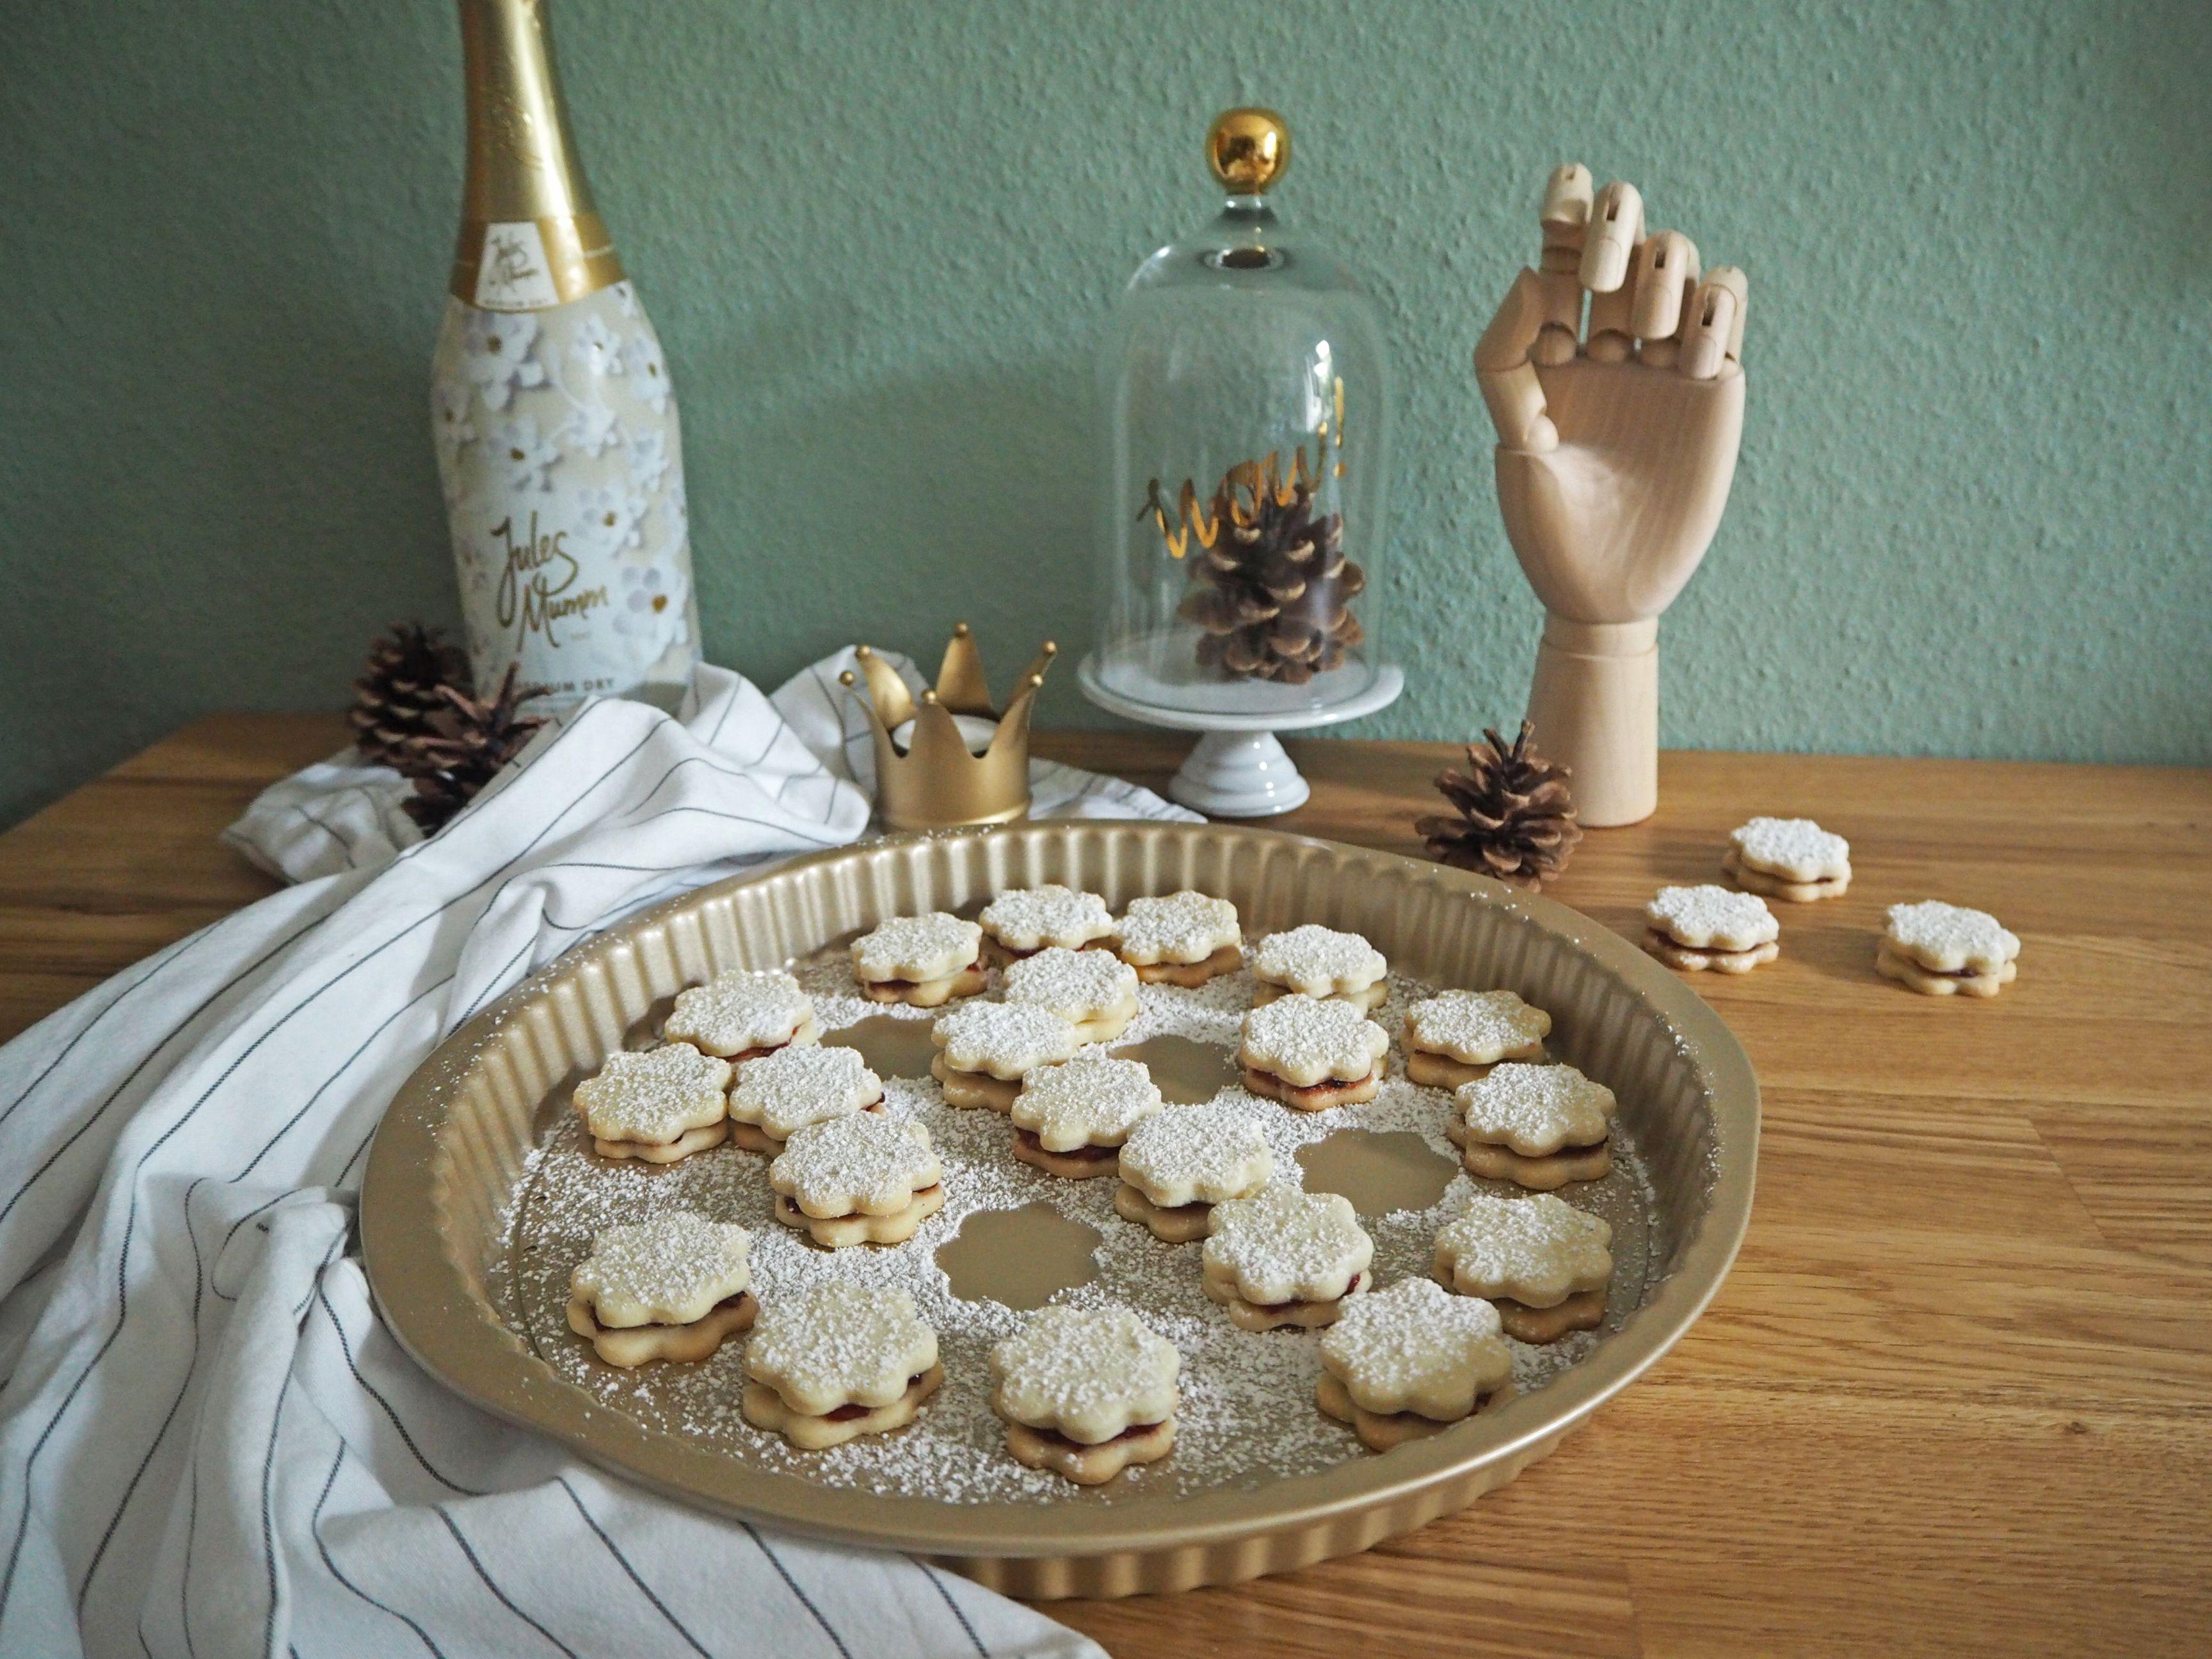 2018-skoen-och-kreativ-food-god-jul-plaetzchen-vanille-cookies-mit-marmelade (1)